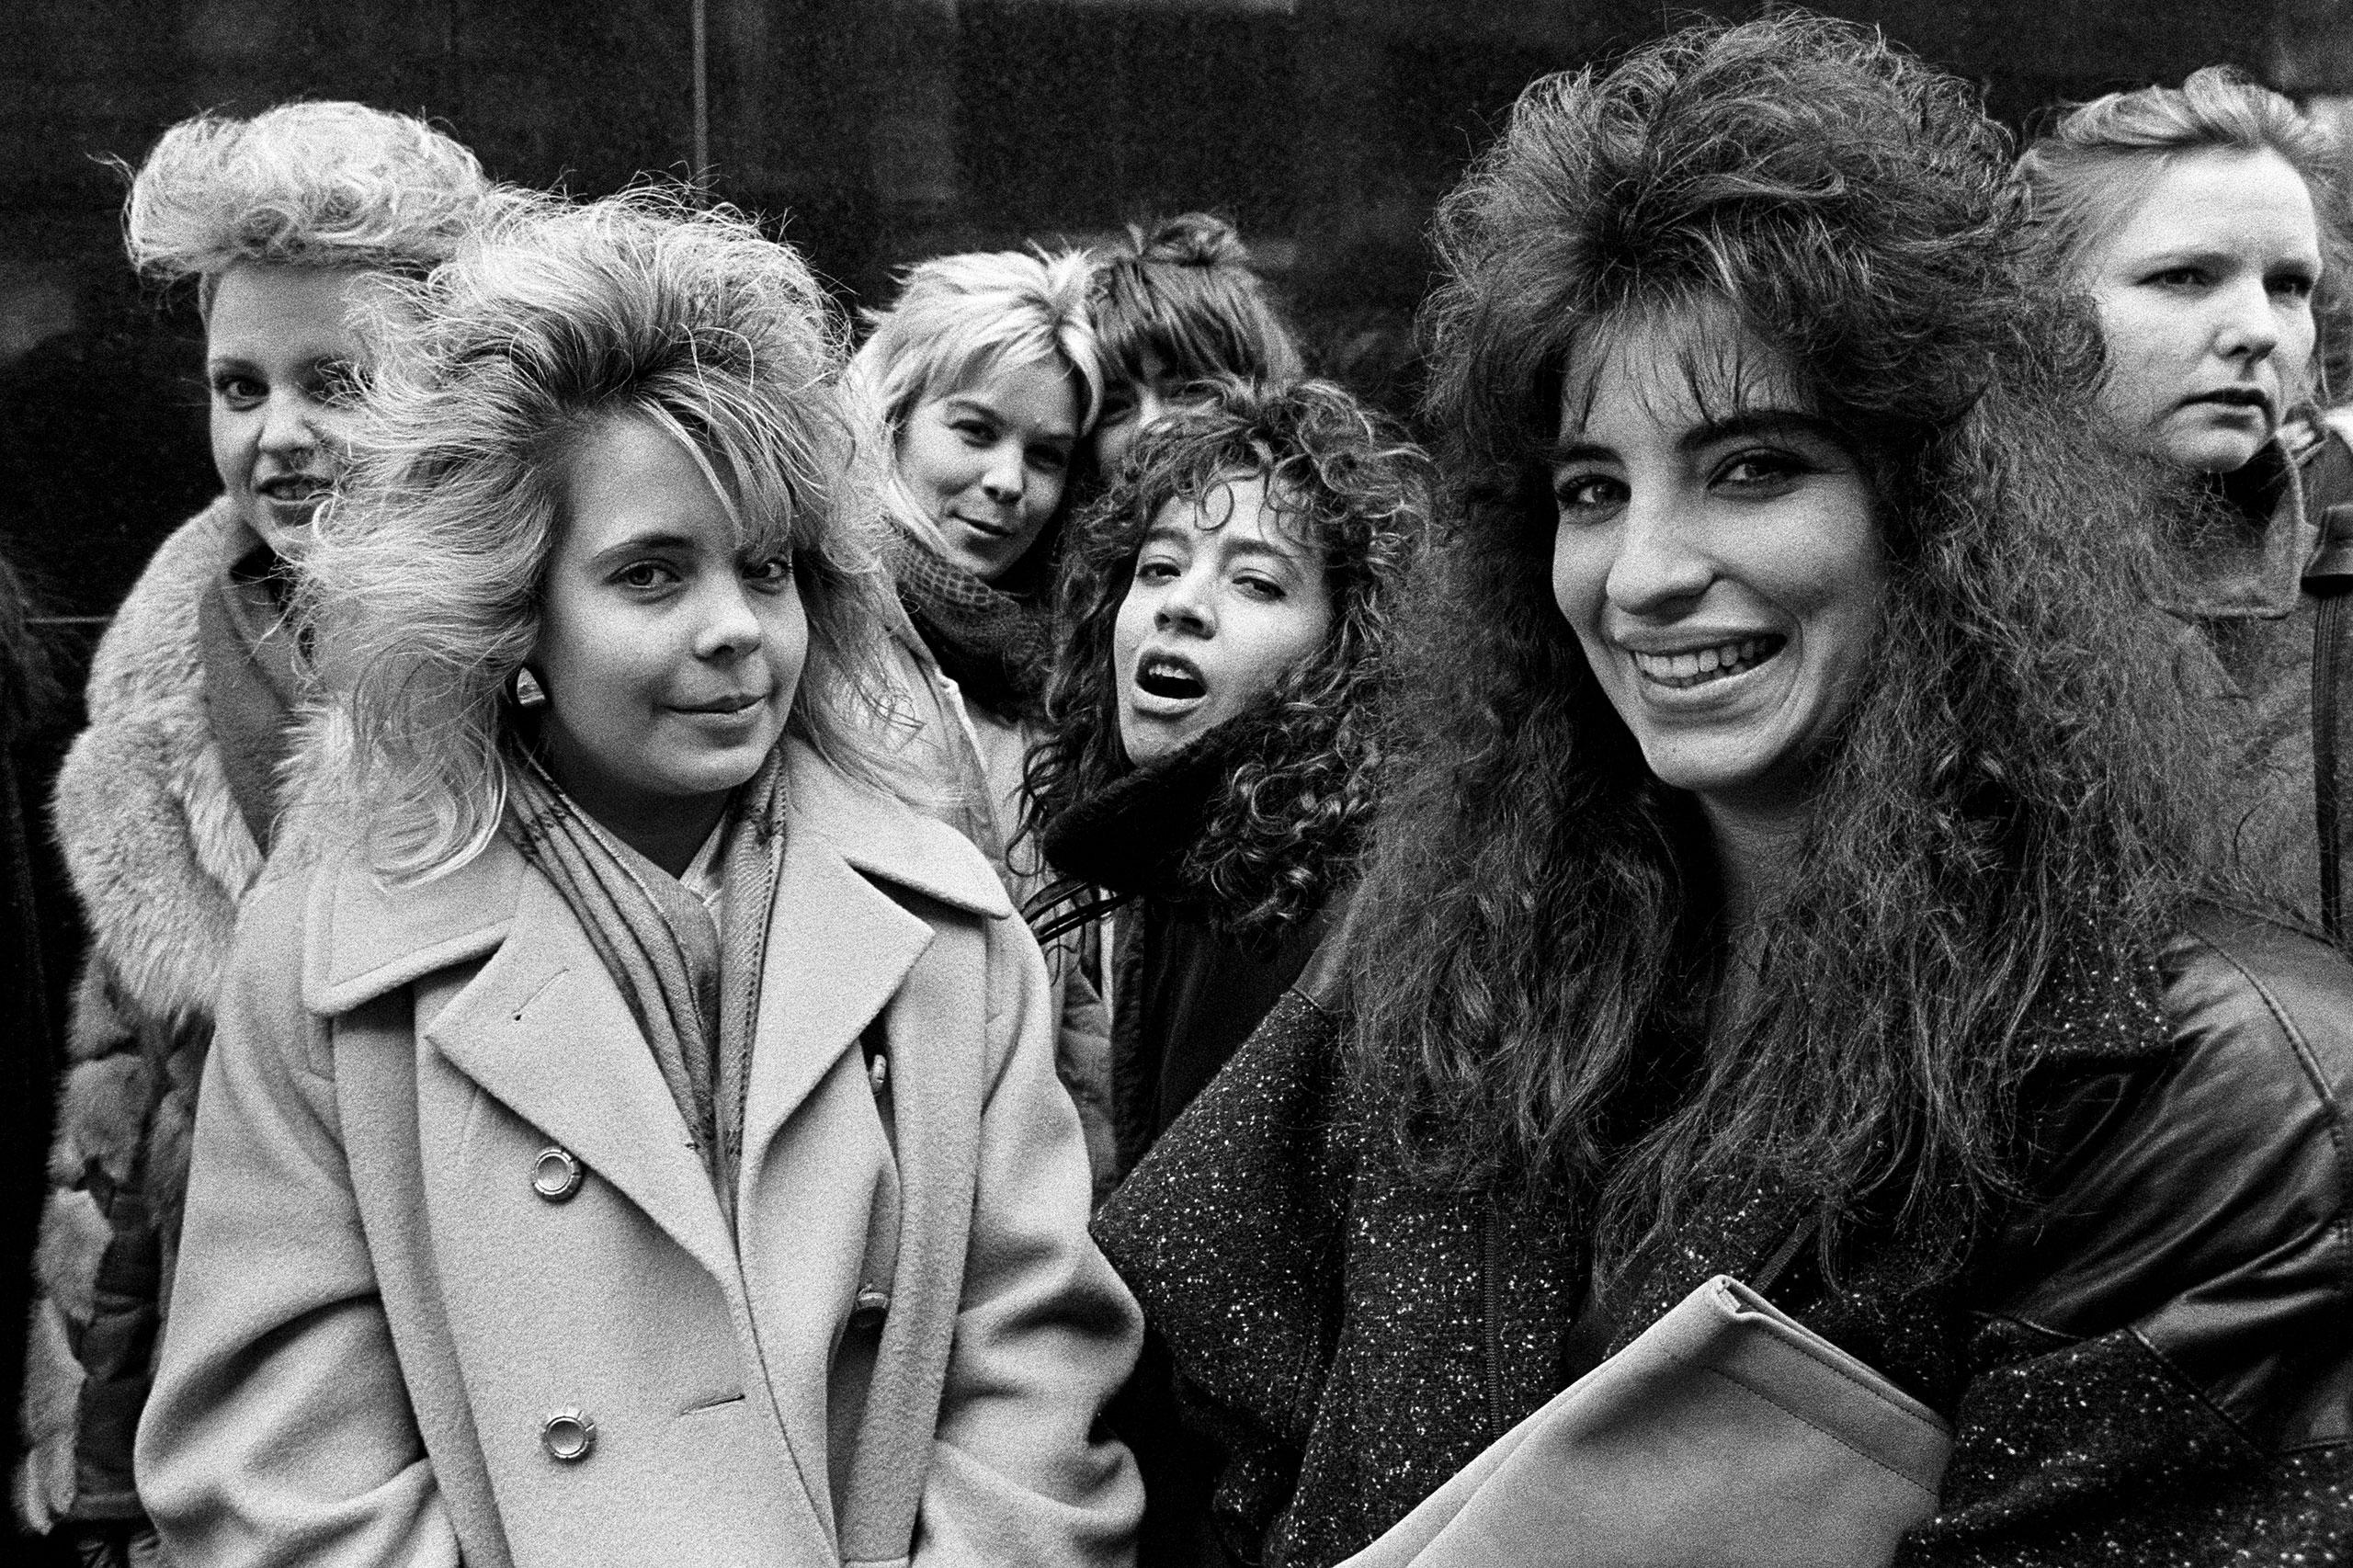 Hair, NYC, 1990